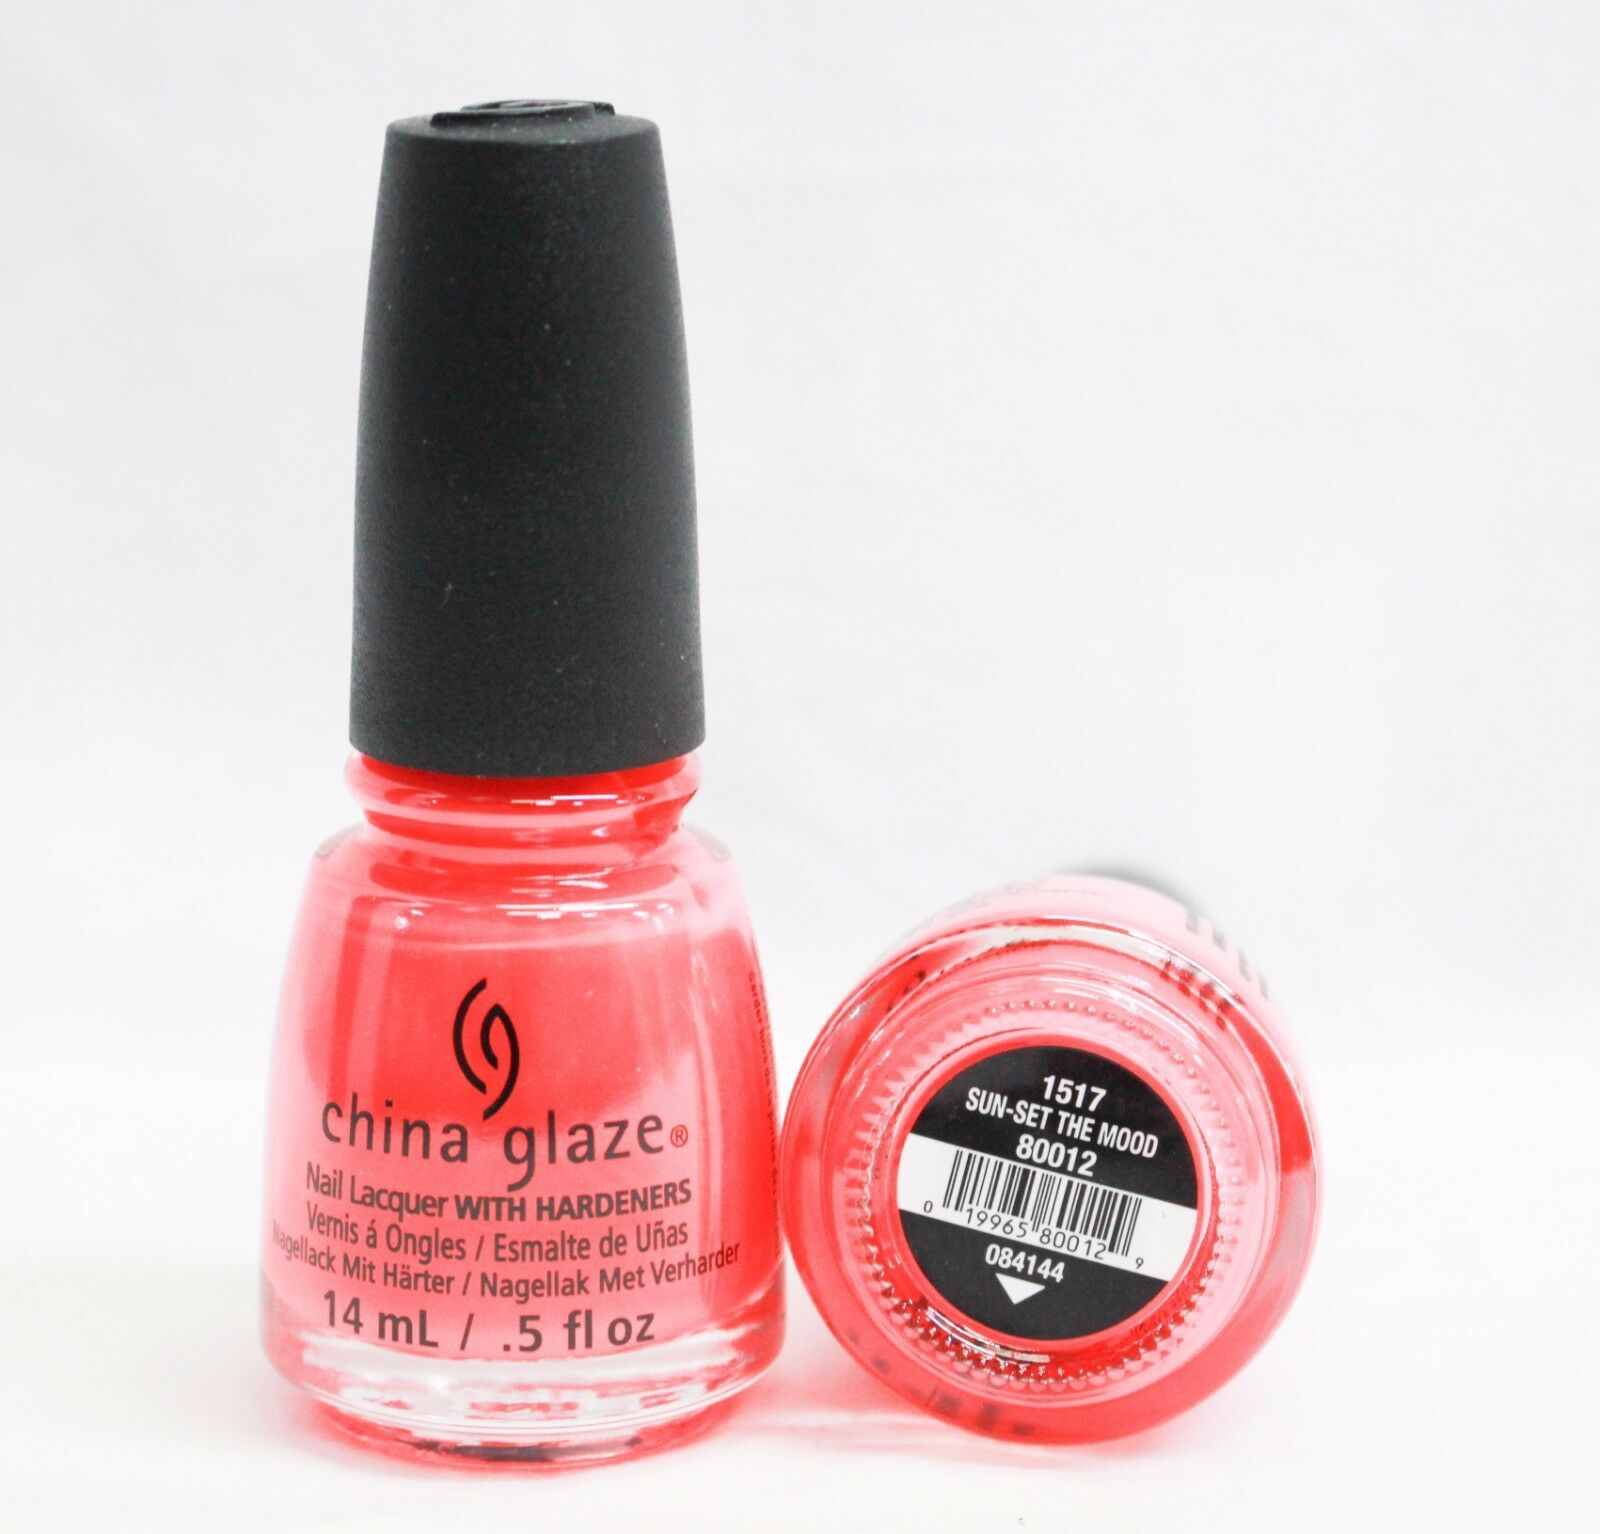 Organic Nail Polish Remover Uk - To Bend Light